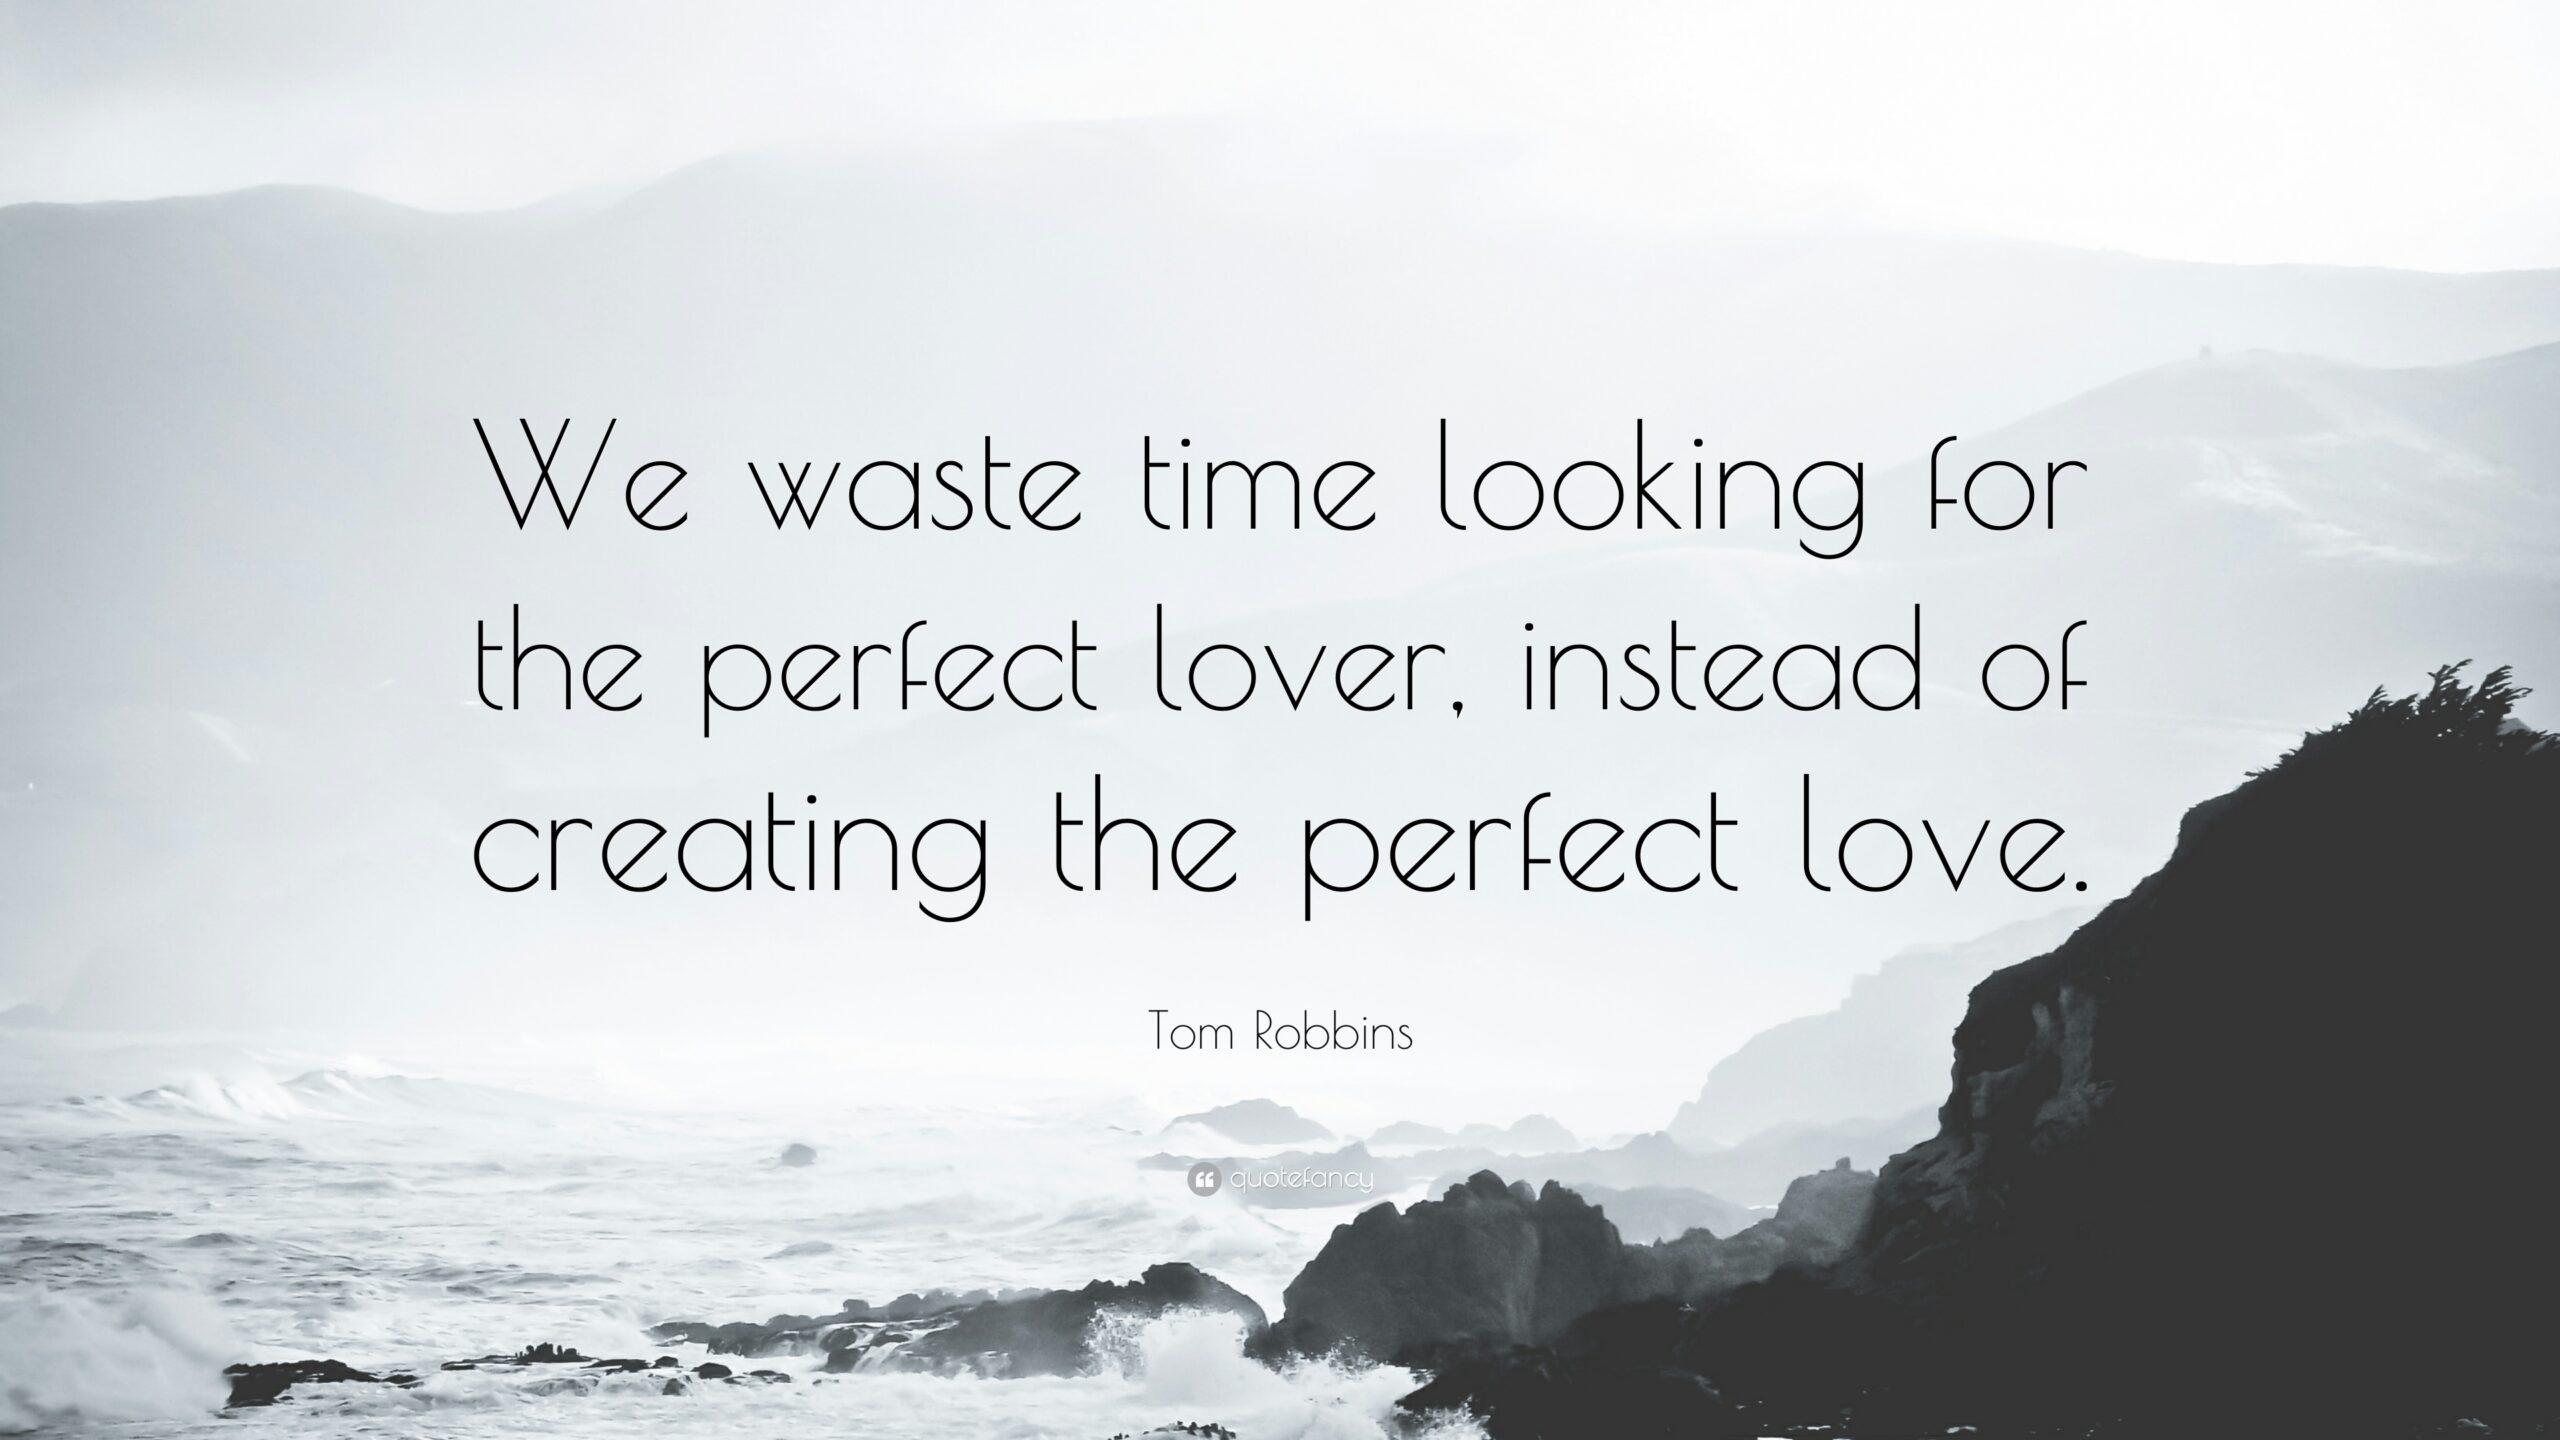 Seeking Perfection vs. Creating a Vision